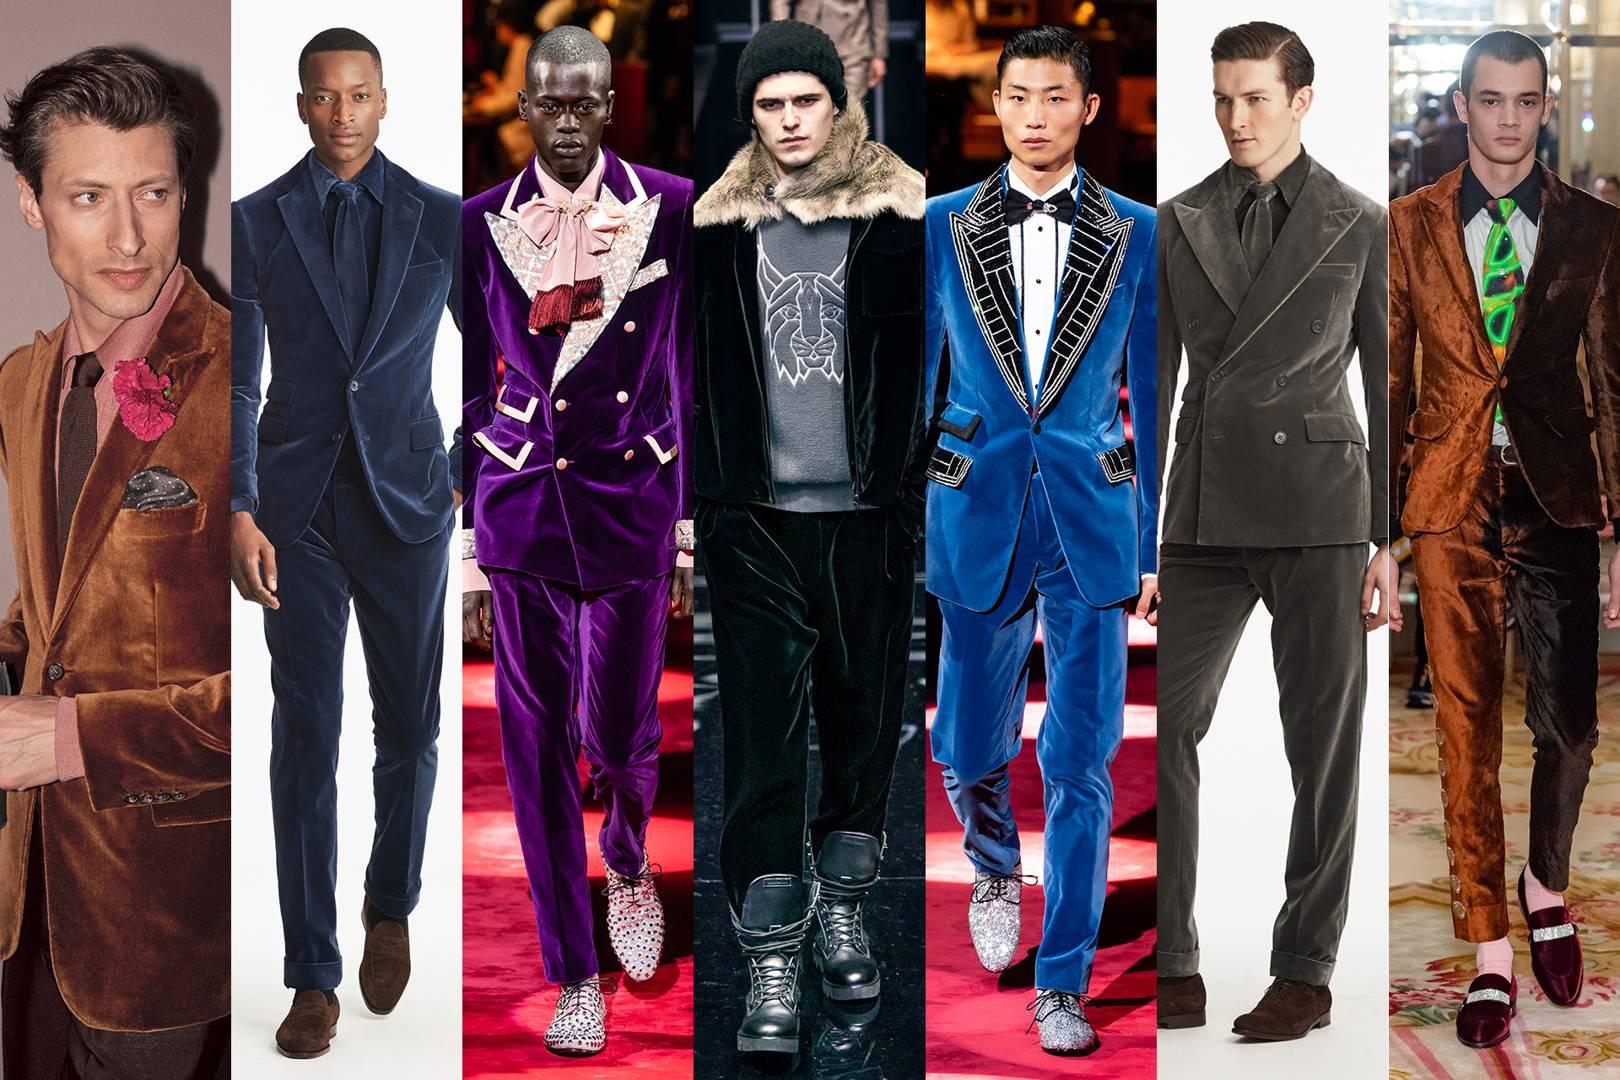 d4089ccde7e Autumn Winter 2019 trends for men